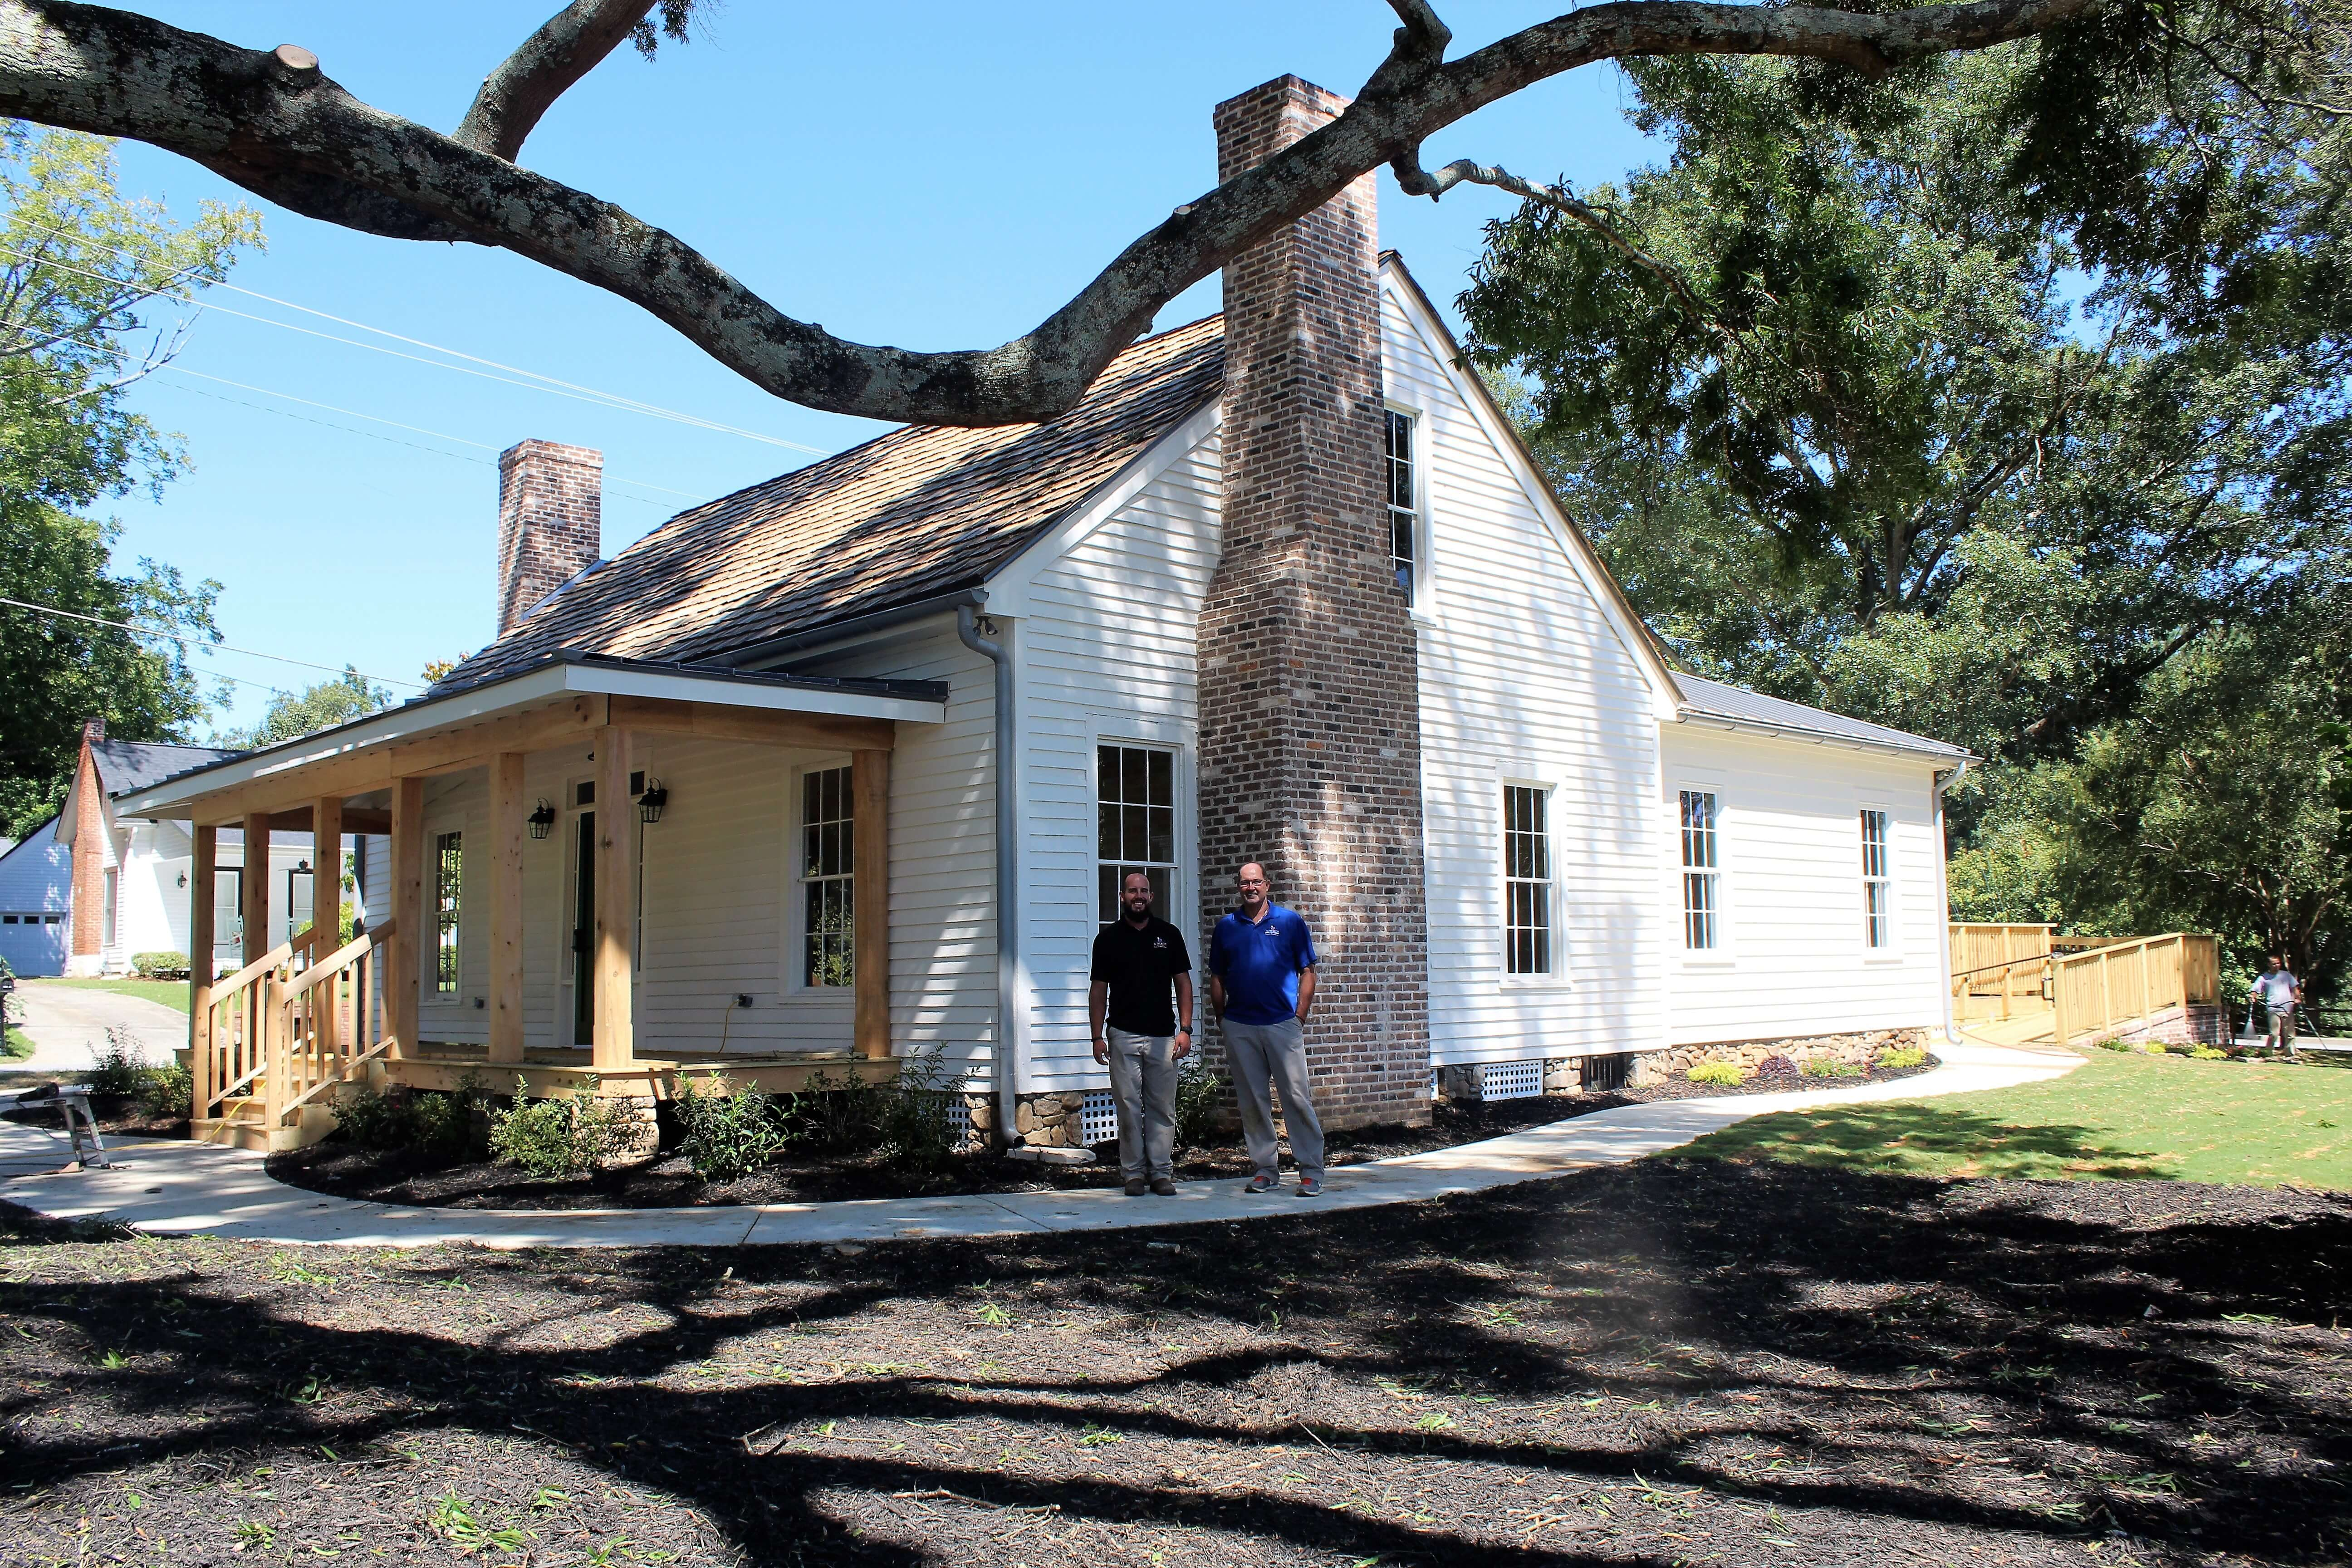 The Farm House at Logan Farm Park